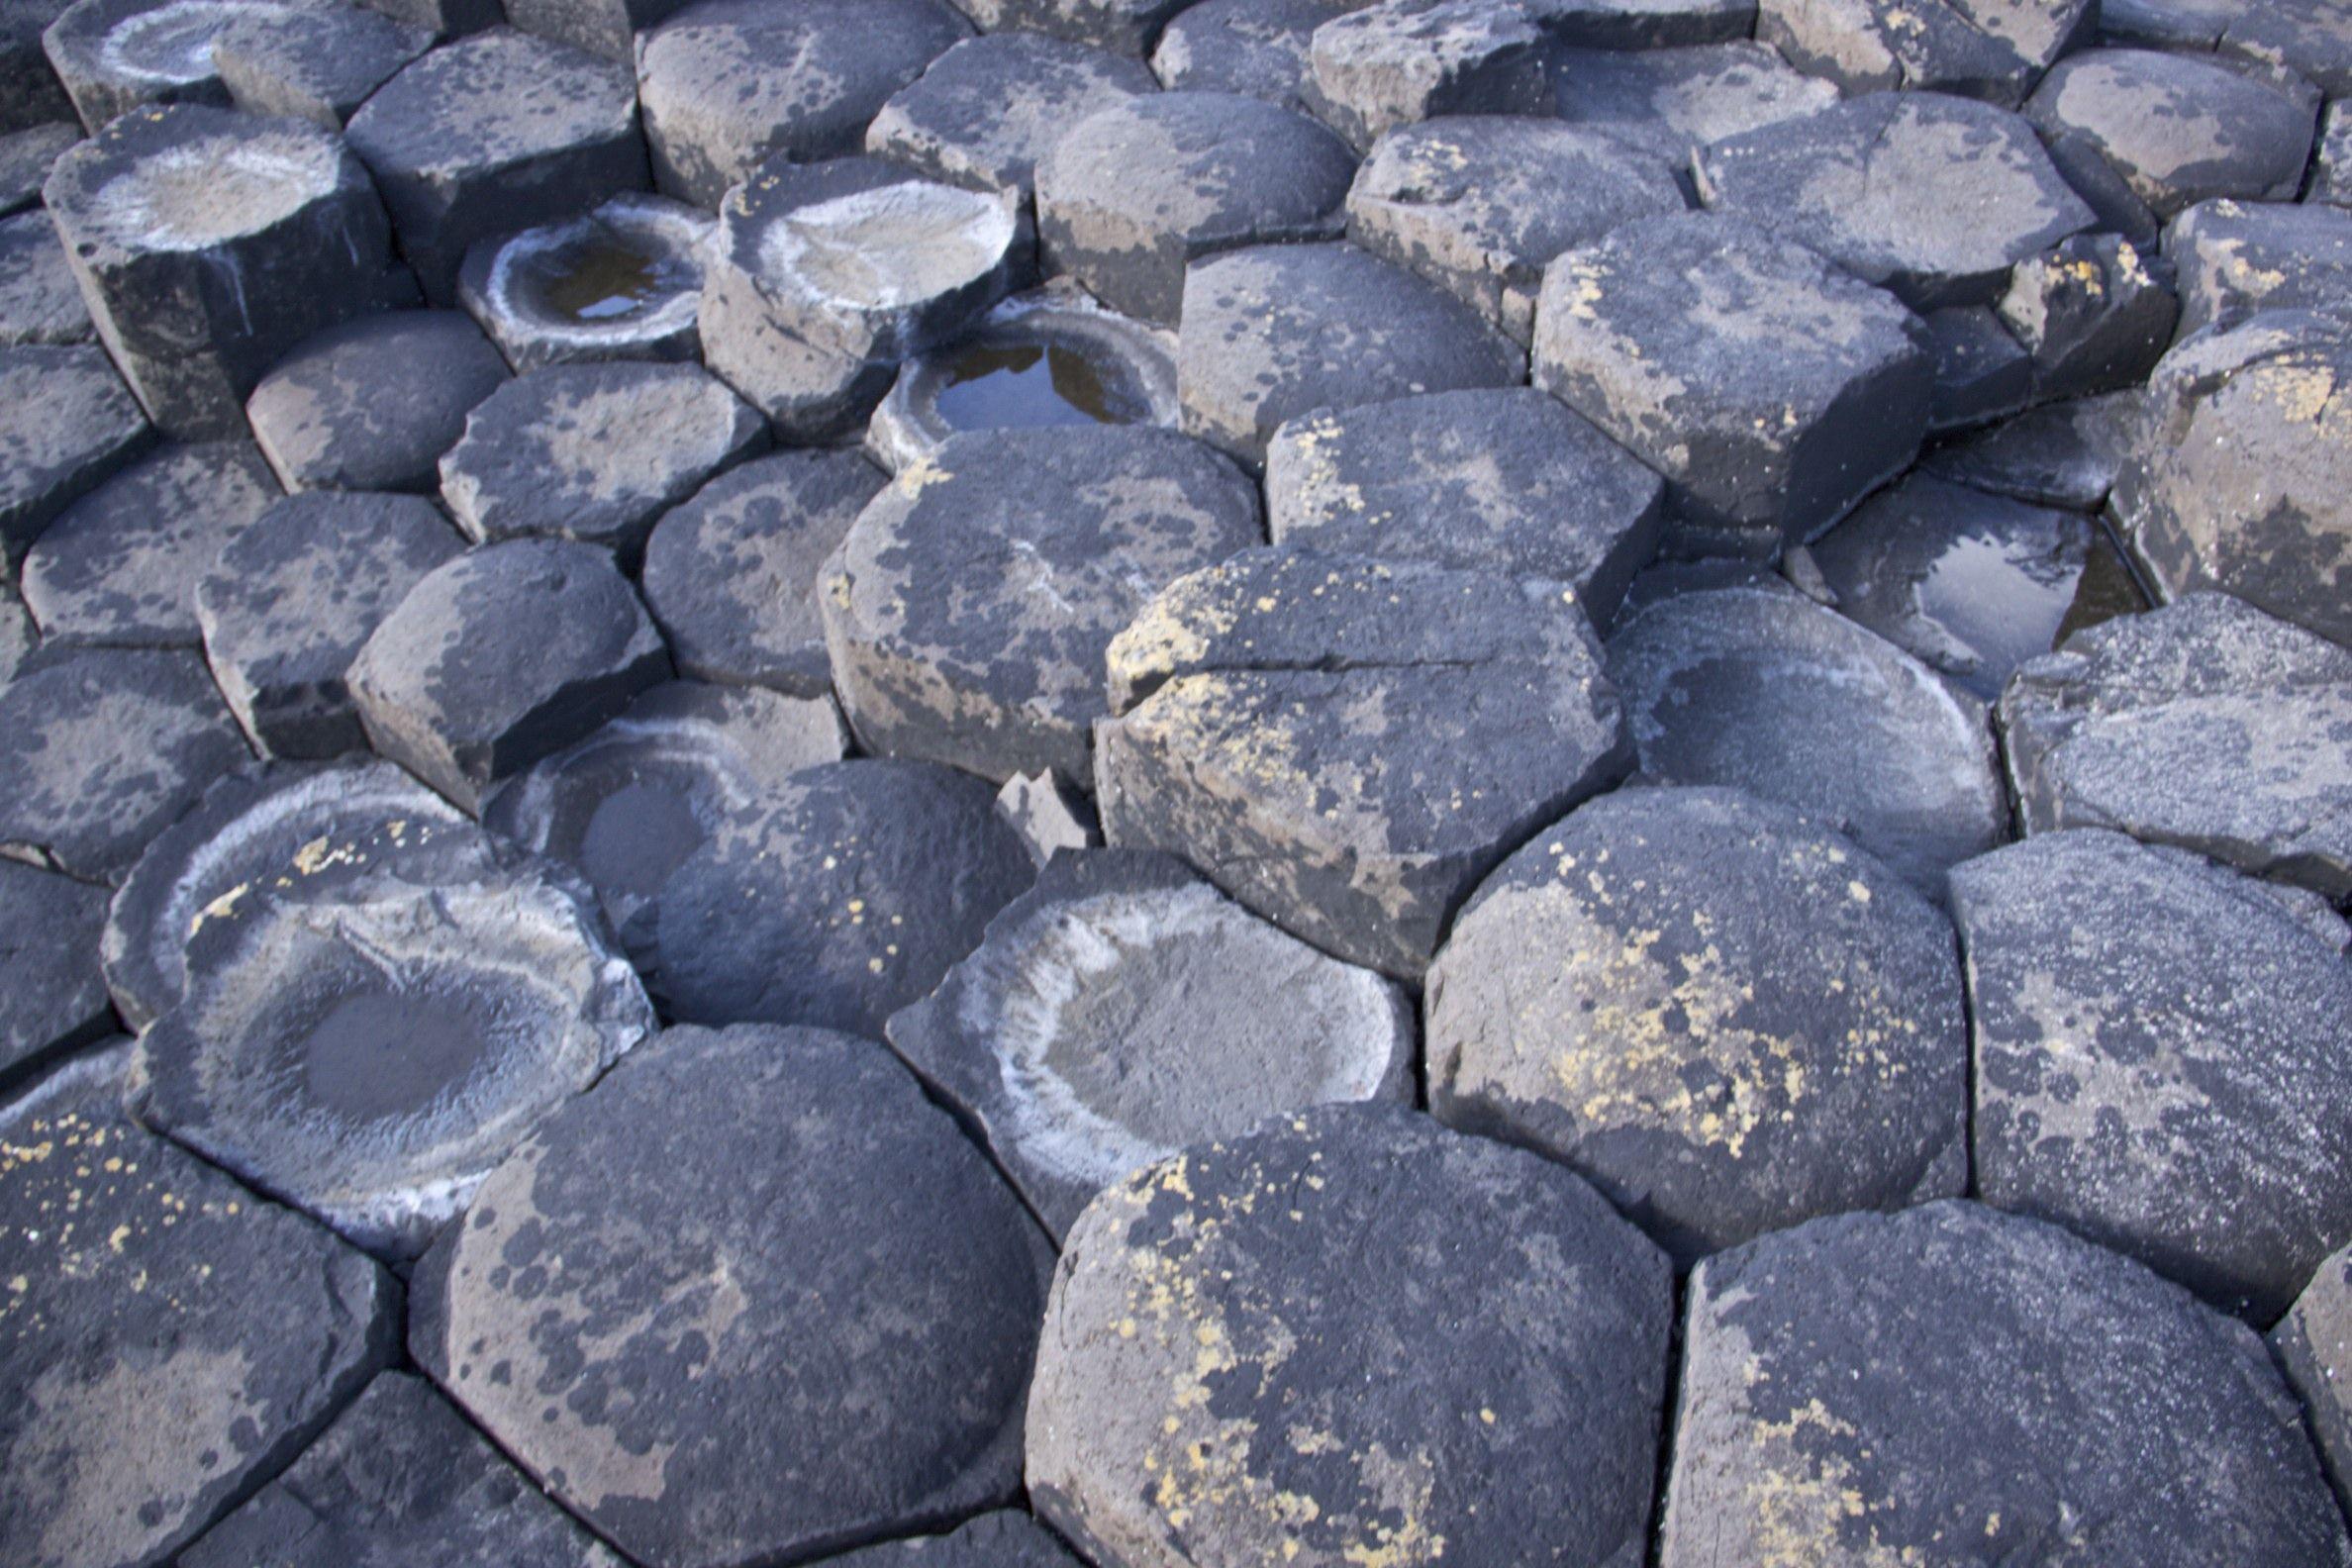 Hexagonal pavement of the Giant's Causeway.